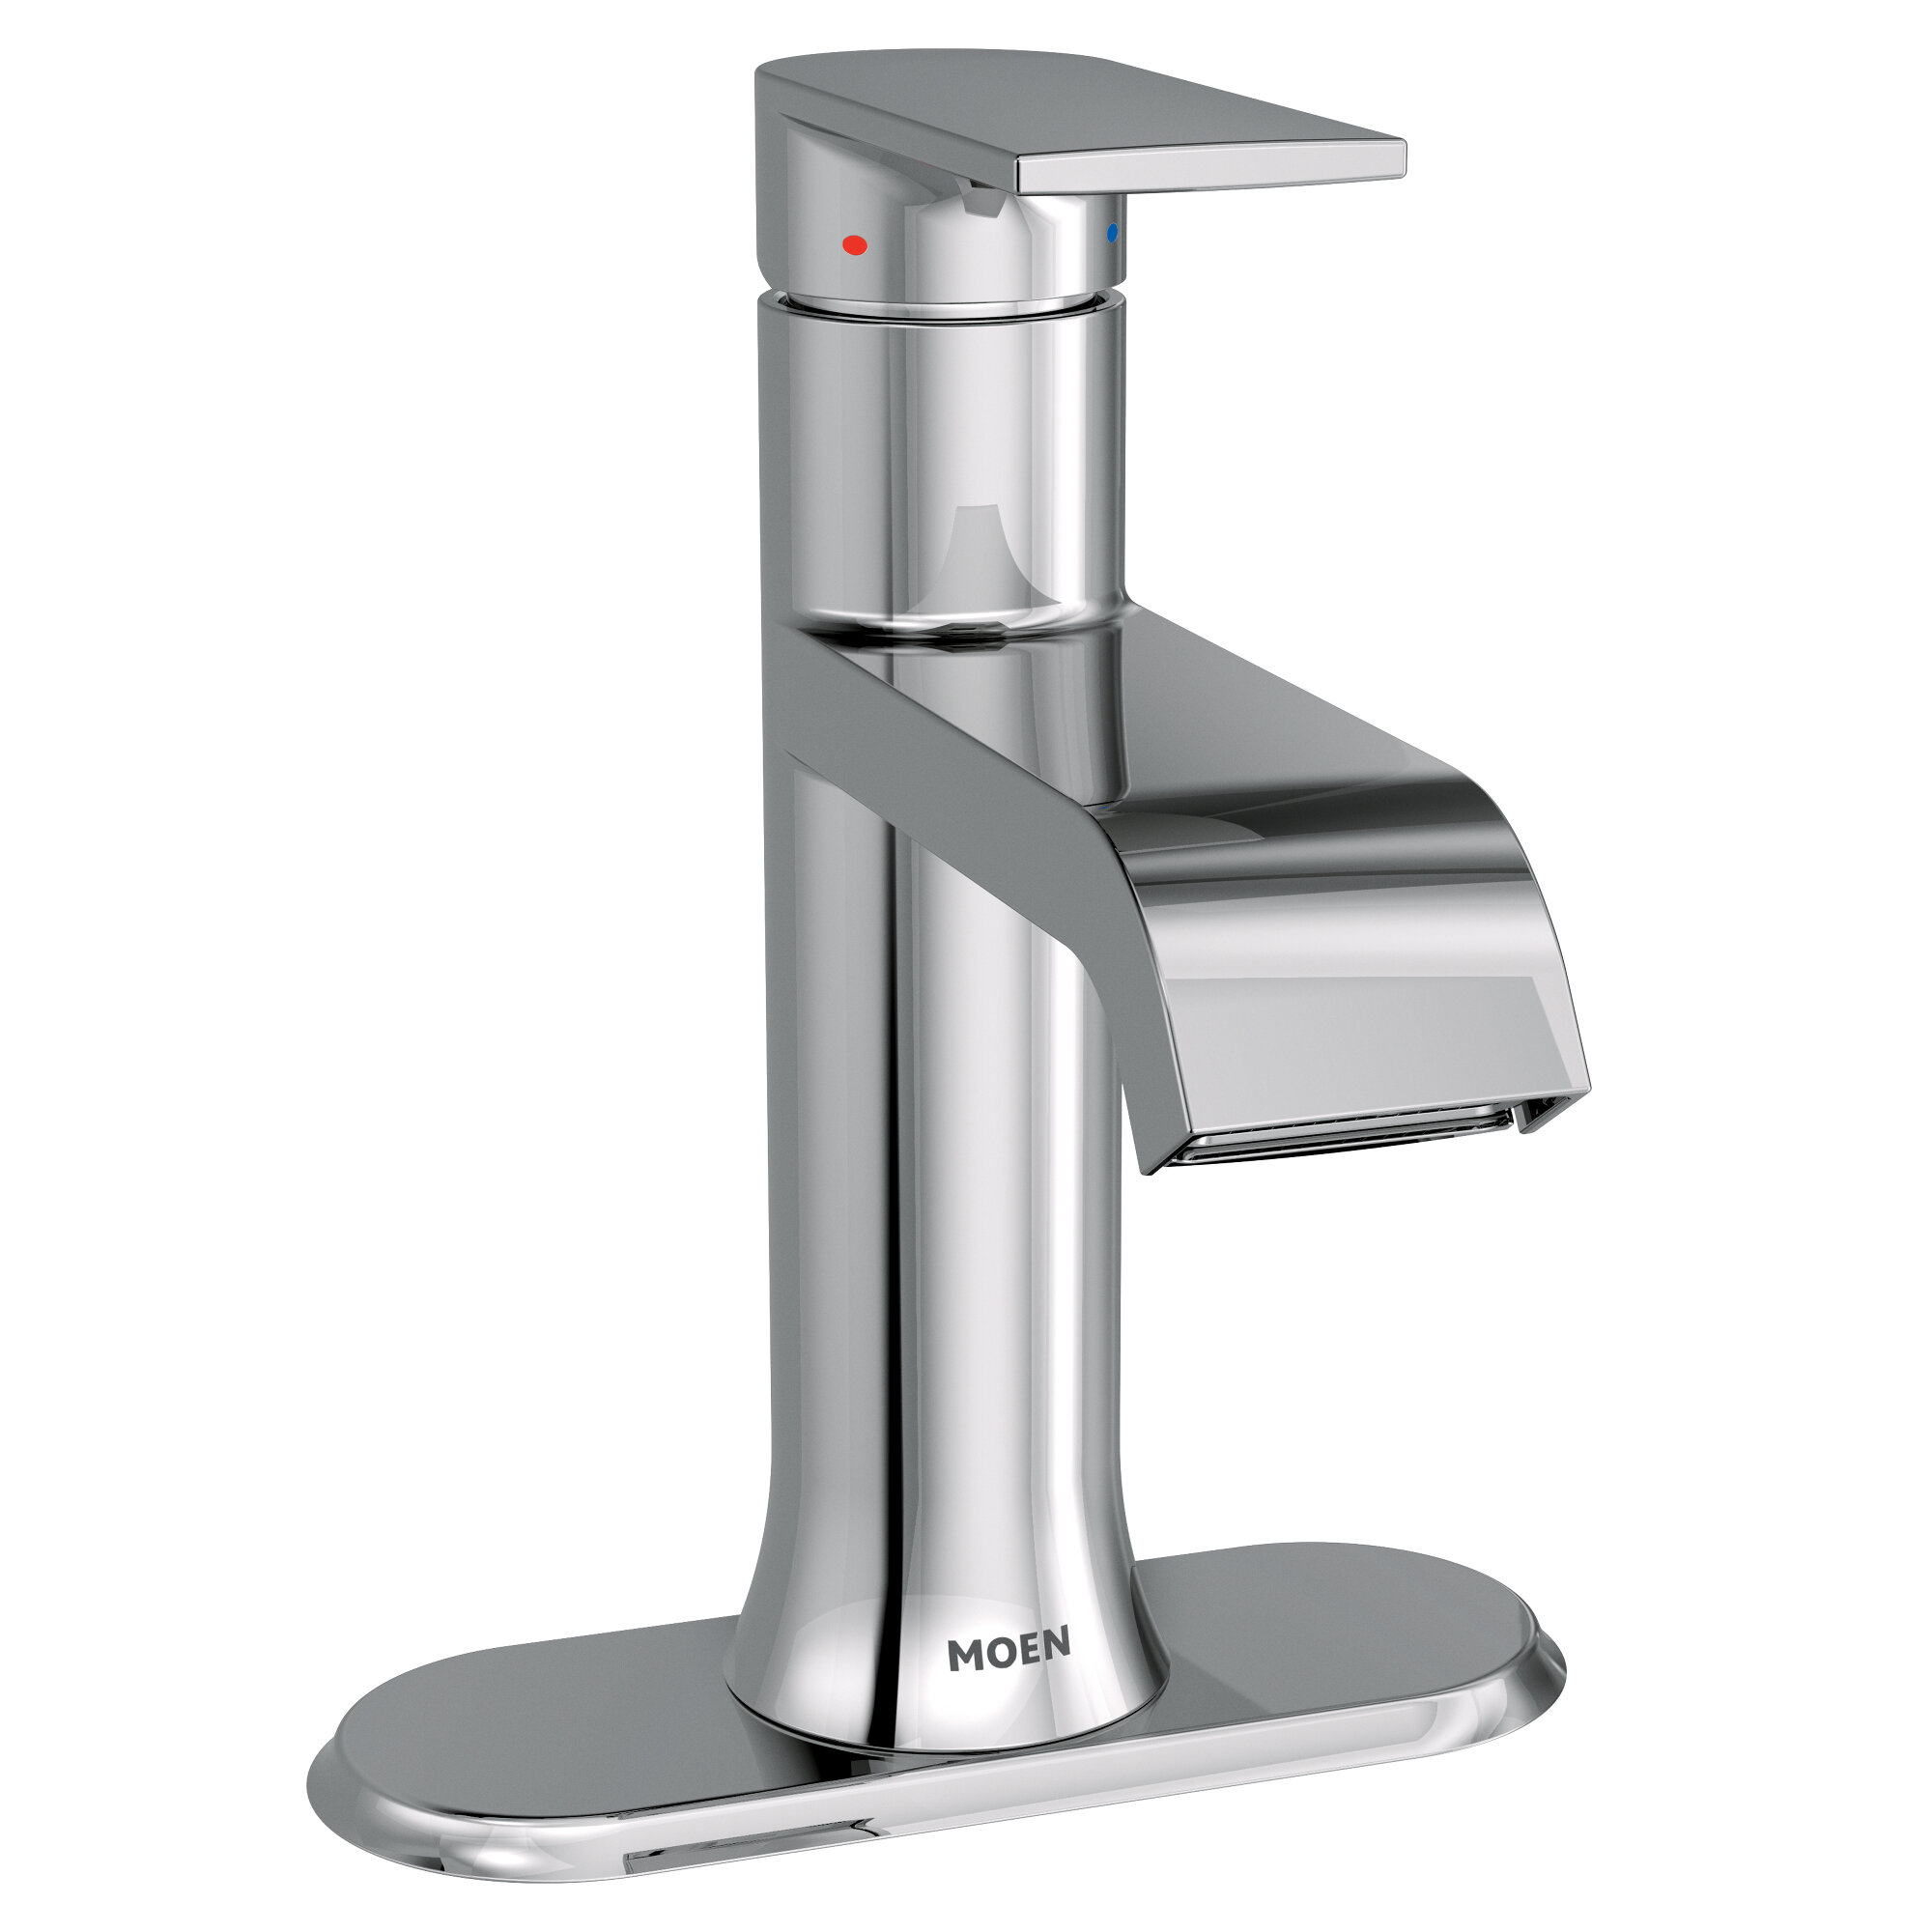 Moen Genta Single Hole Bathroom Faucet